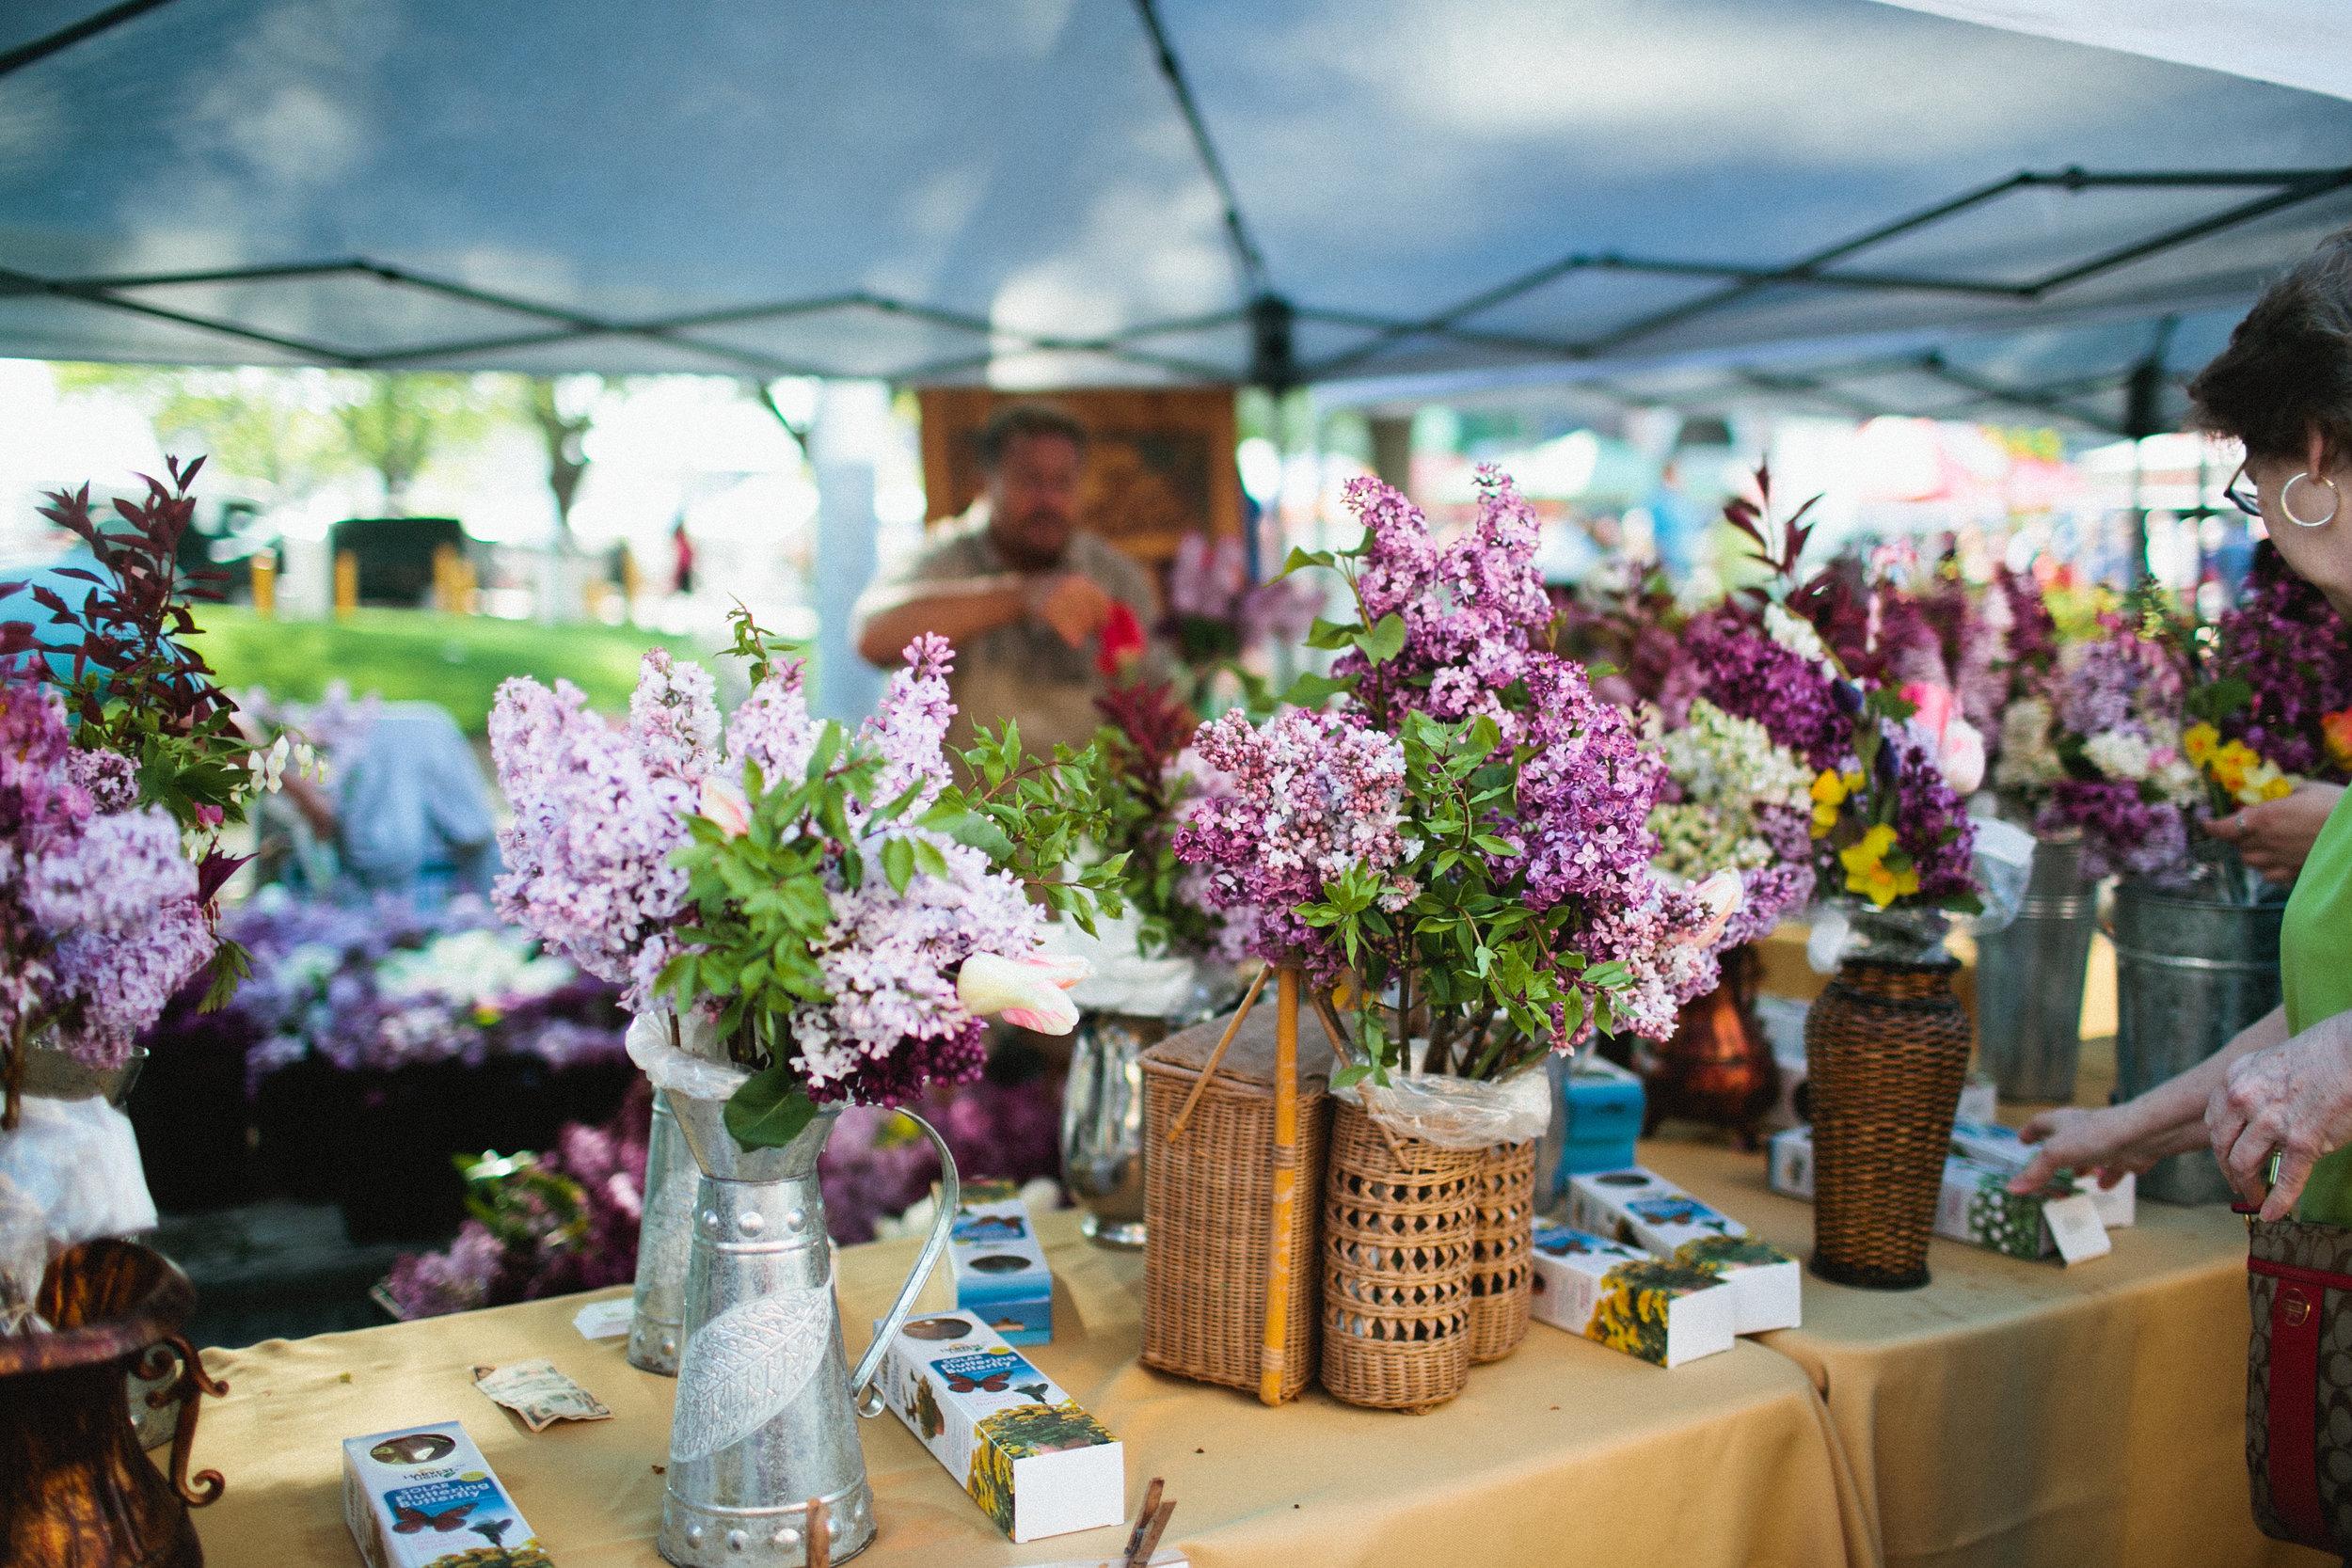 hyacinth flowers des moines farmers market